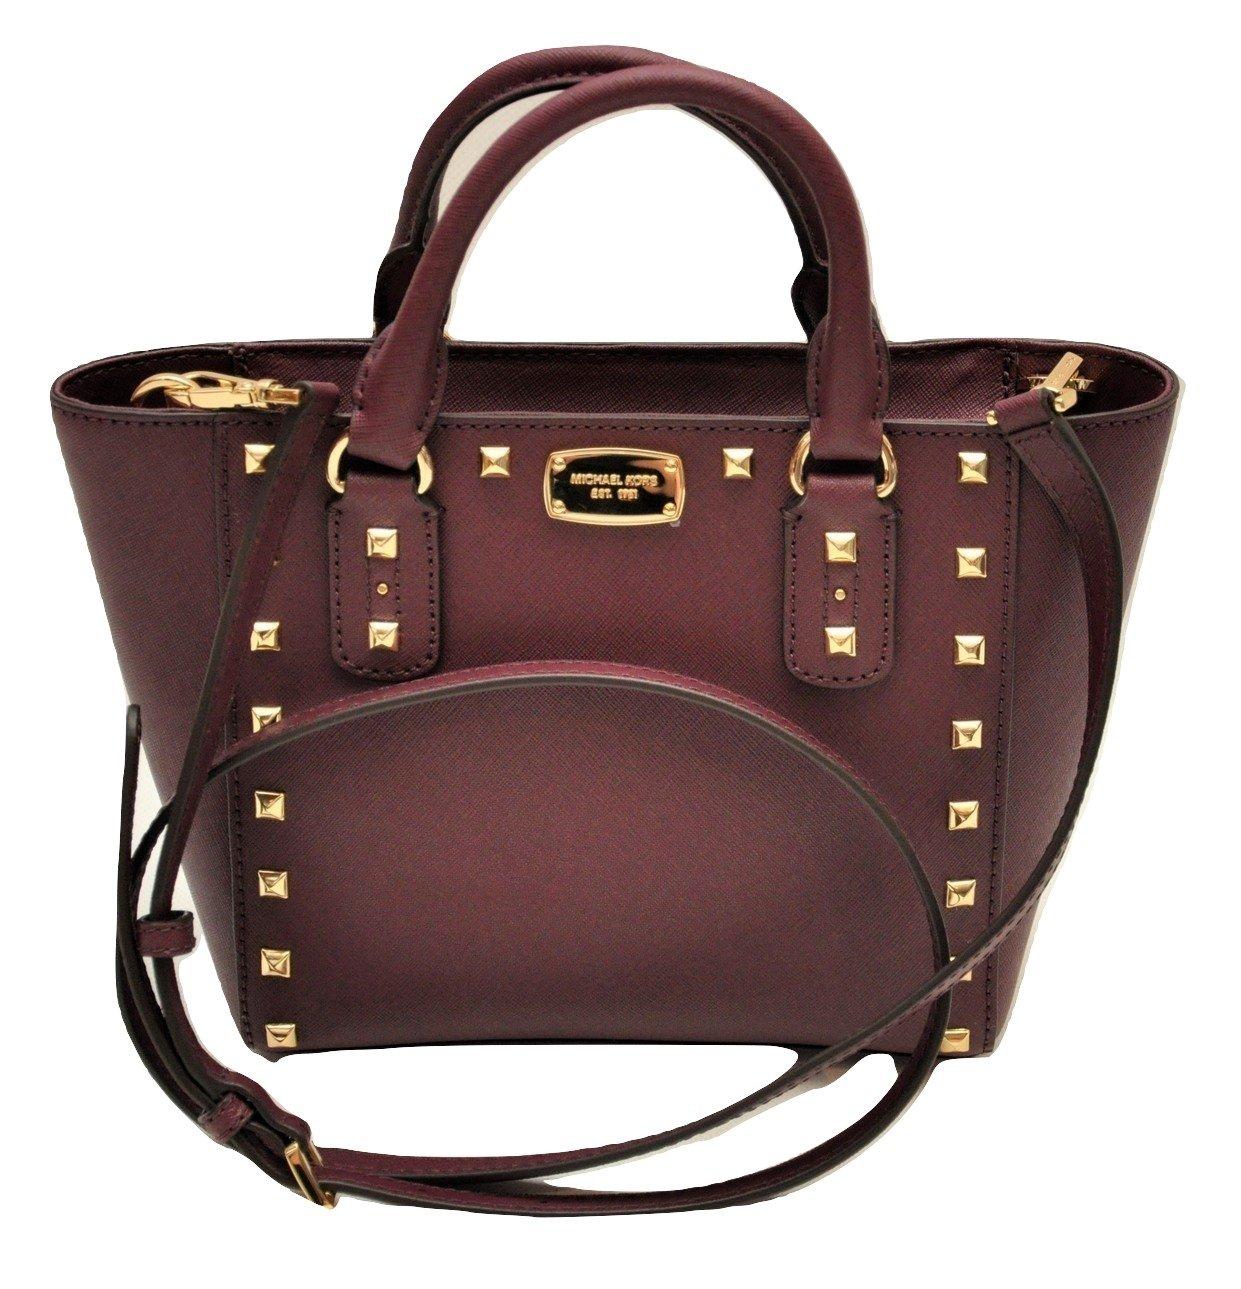 Michael Kors Sandrine Stud Small Crossbody Saffiano Leather Bag Handbag (Plum)